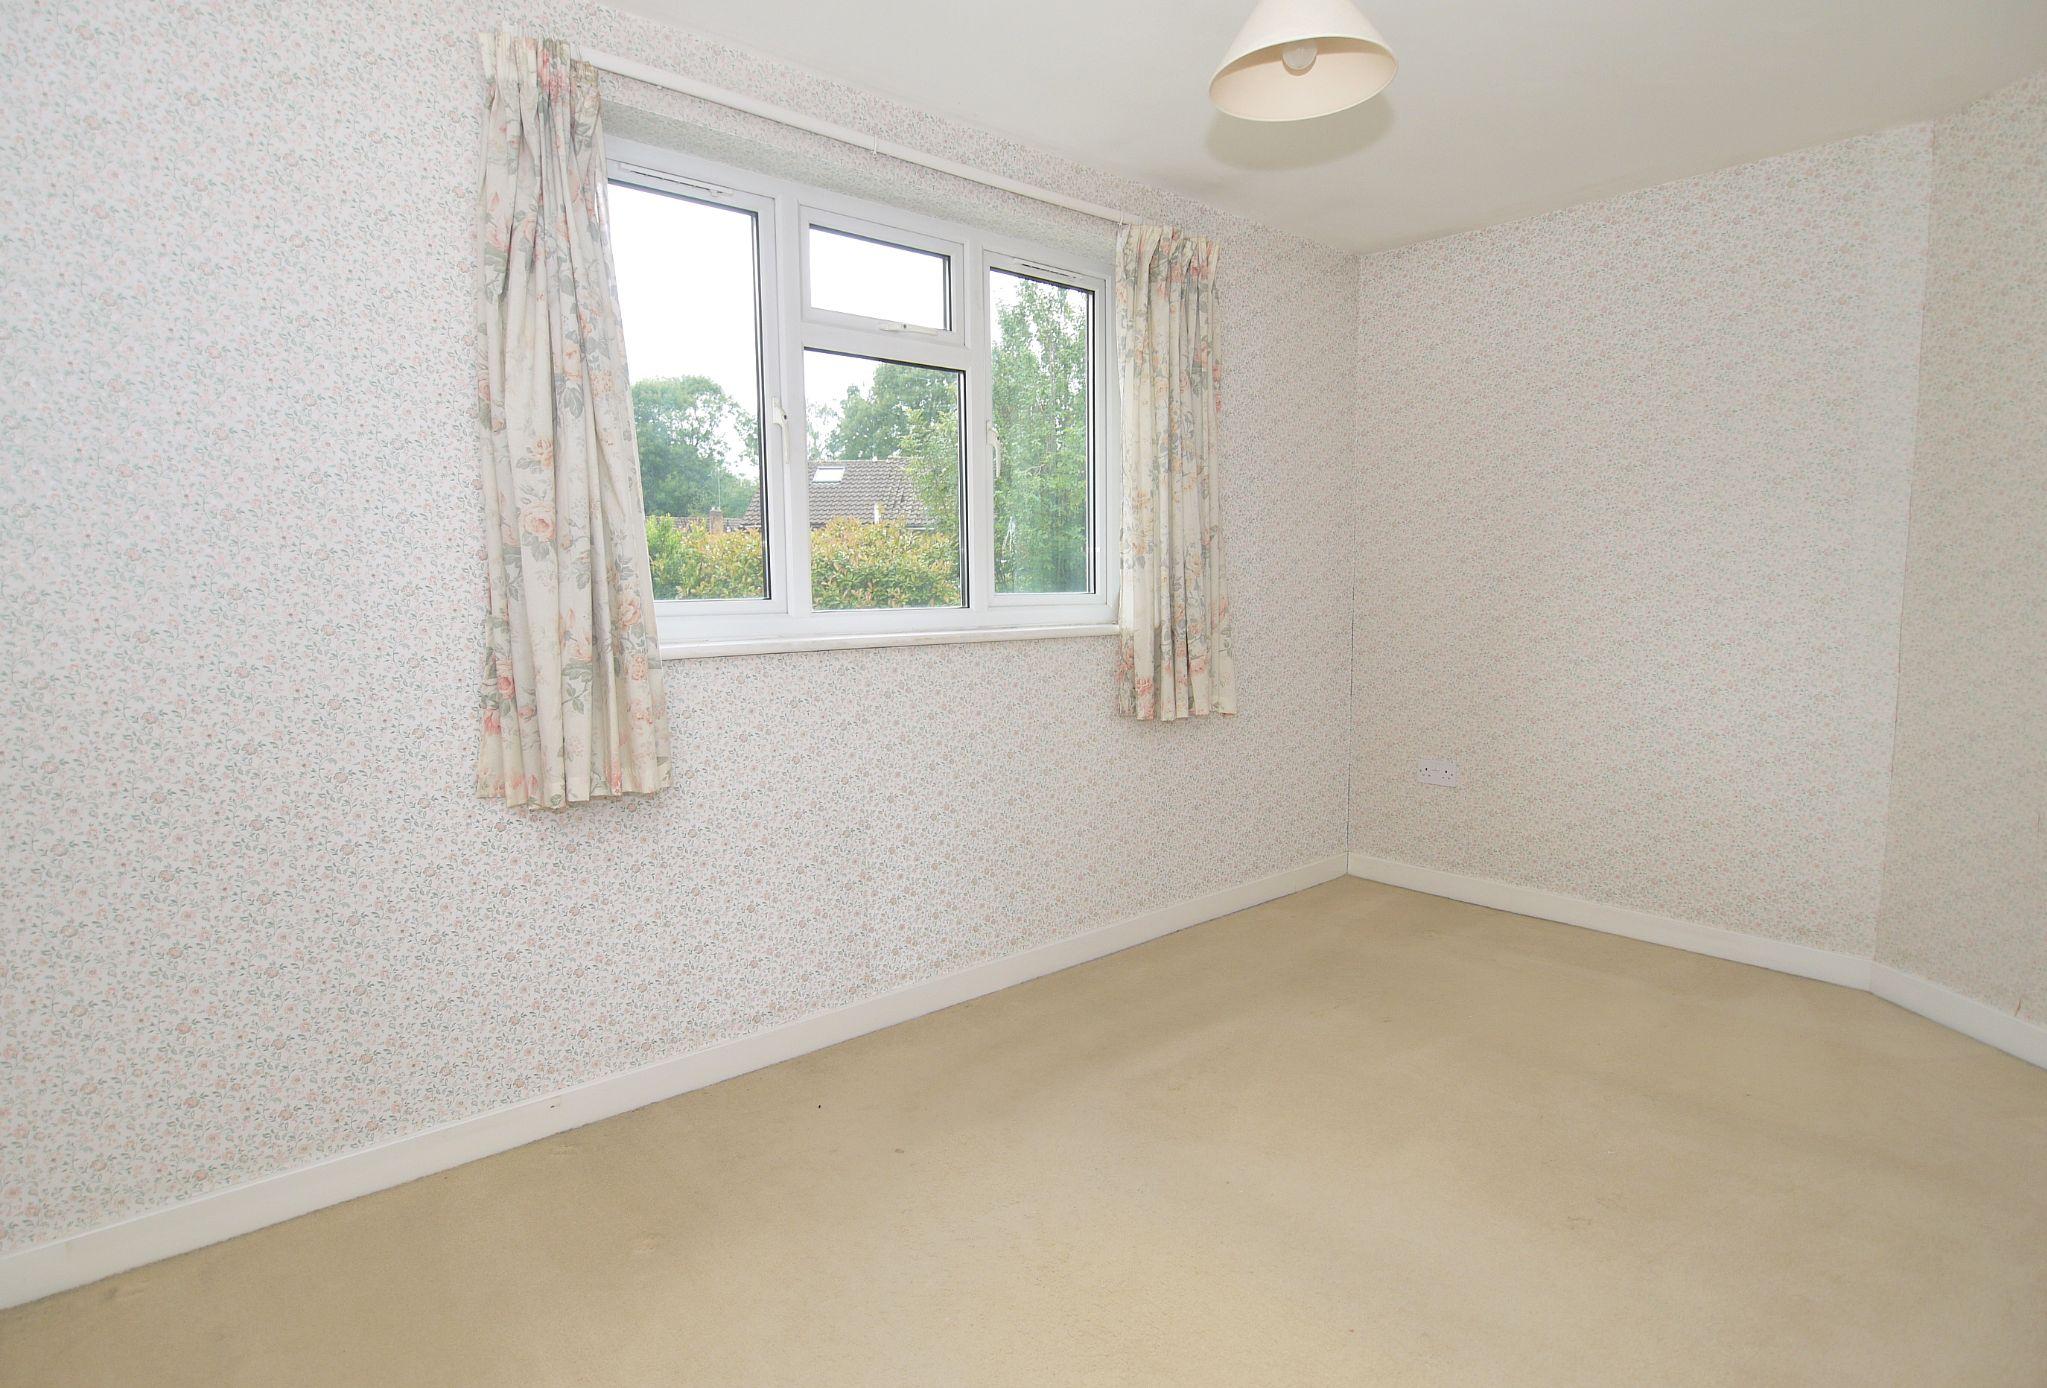 5 bedroom semi-detached house Sold in Sevenoaks - Photograph 6